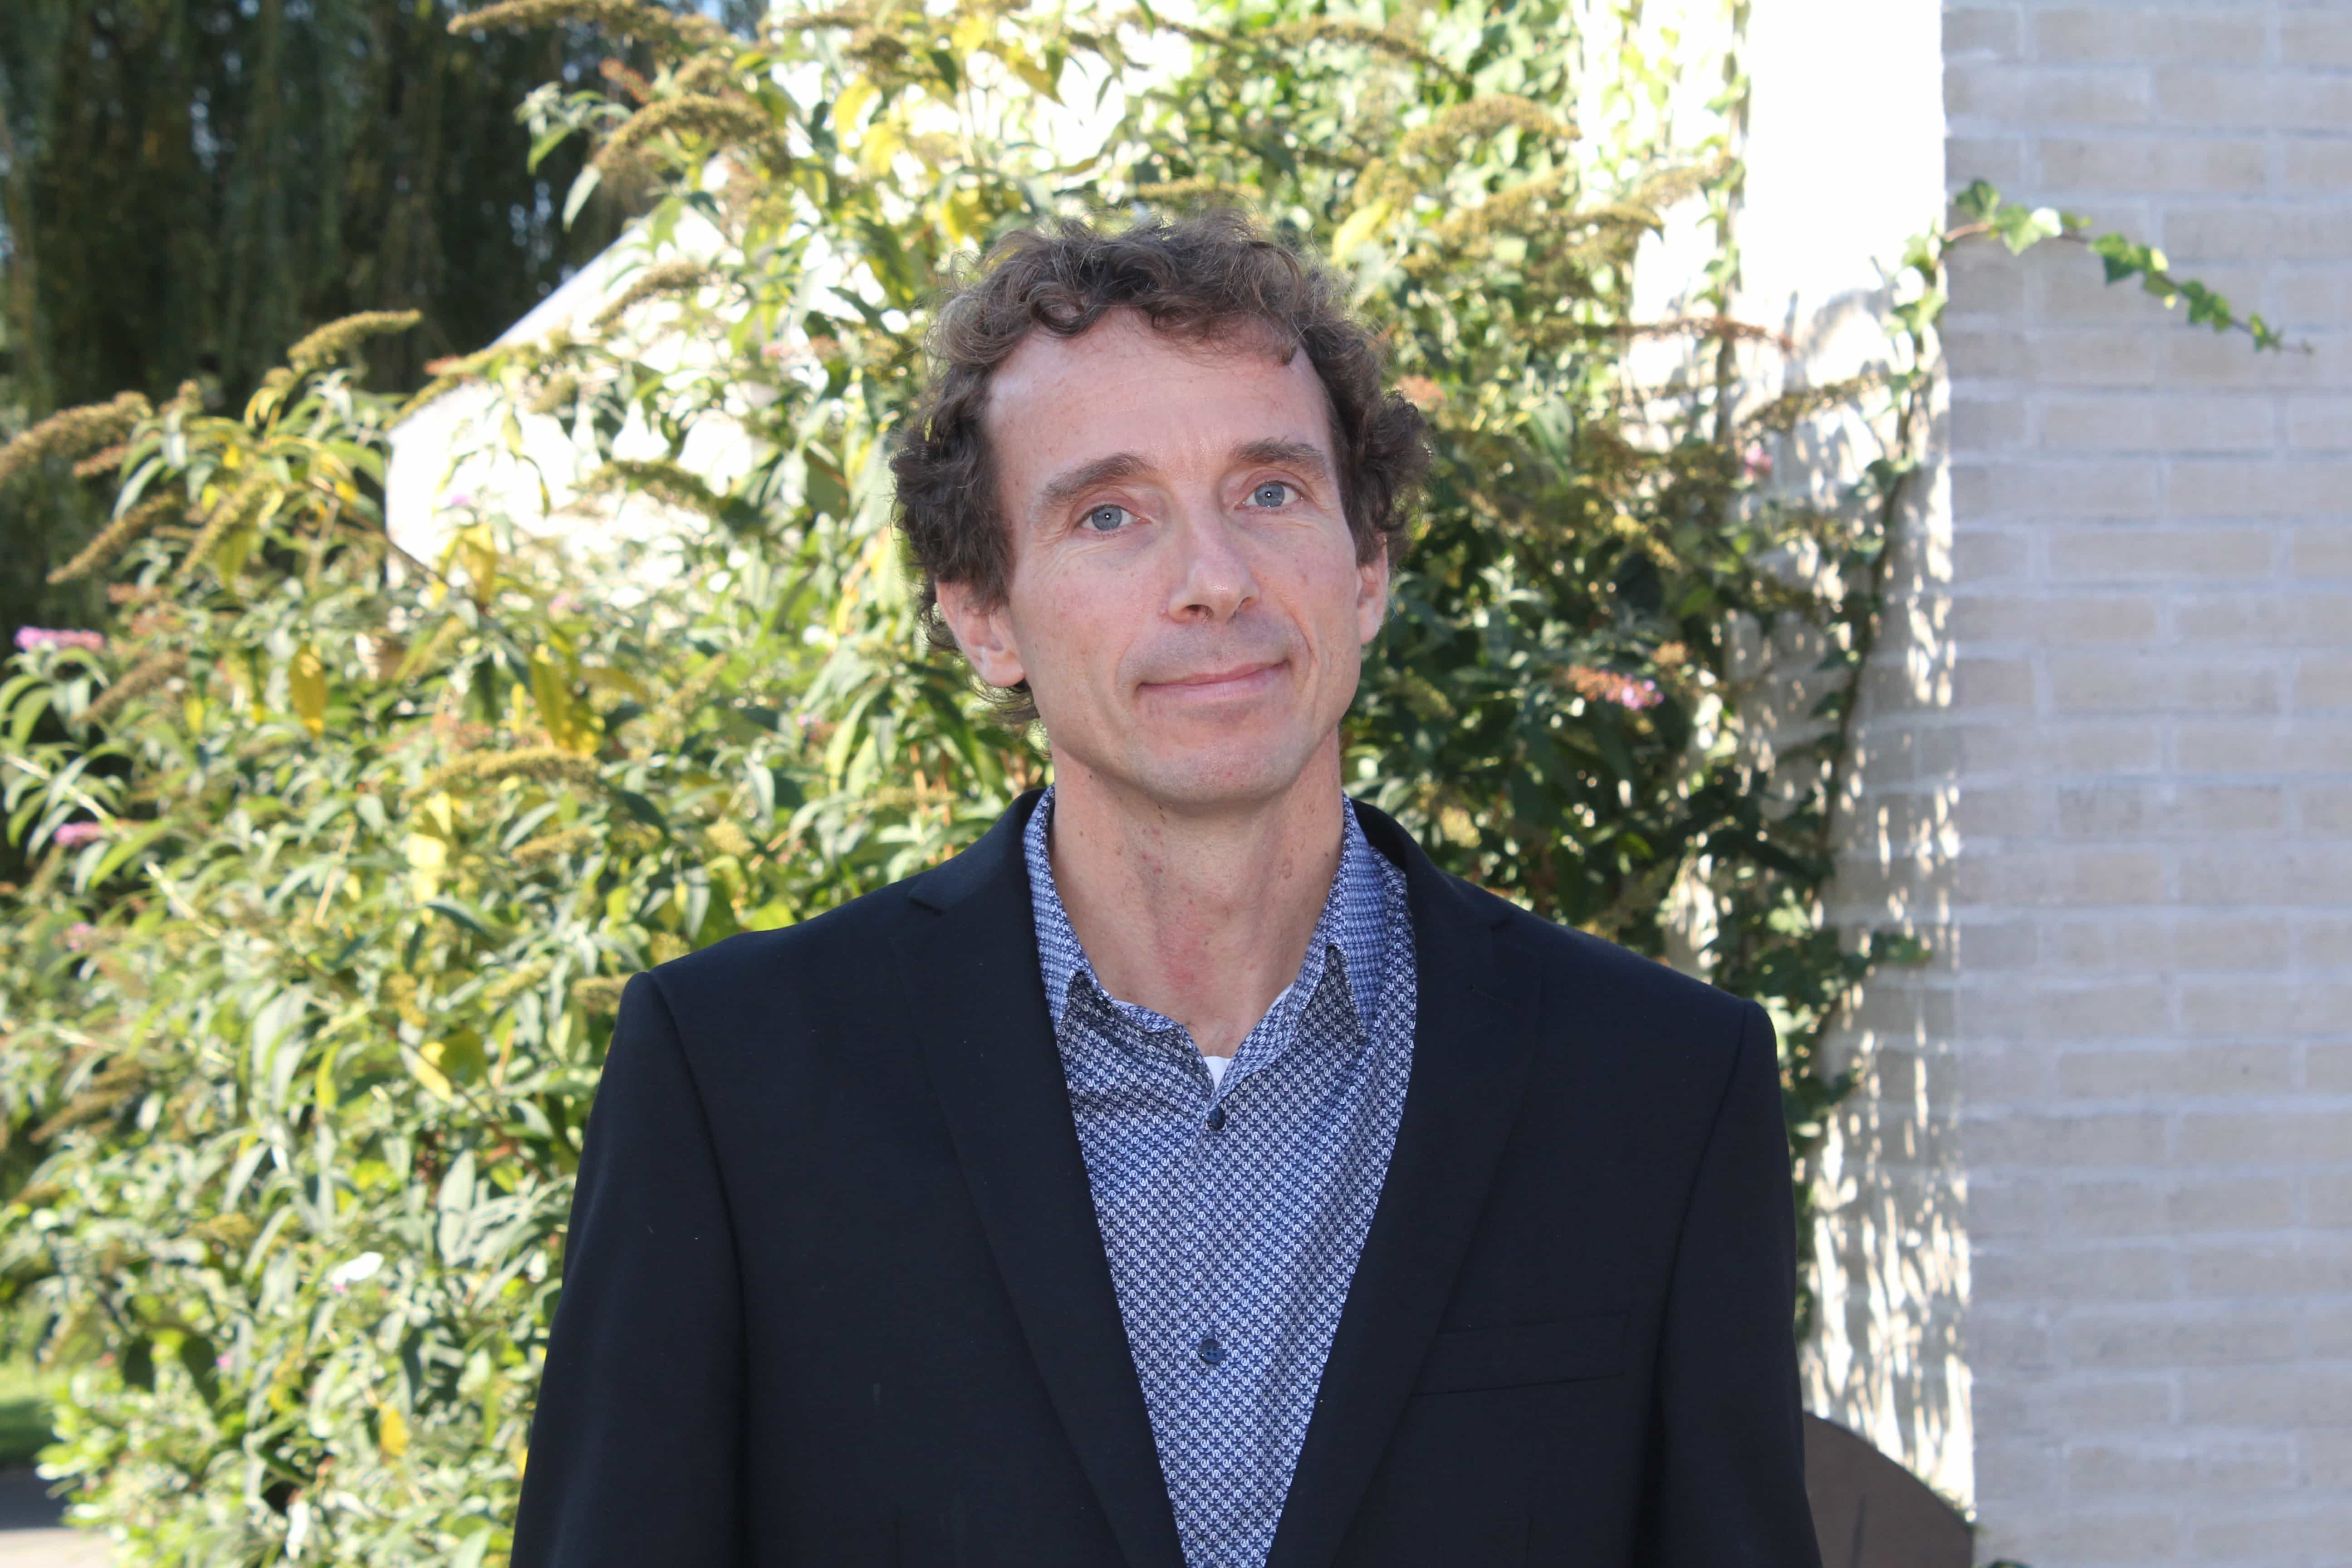 Michael Brouwer